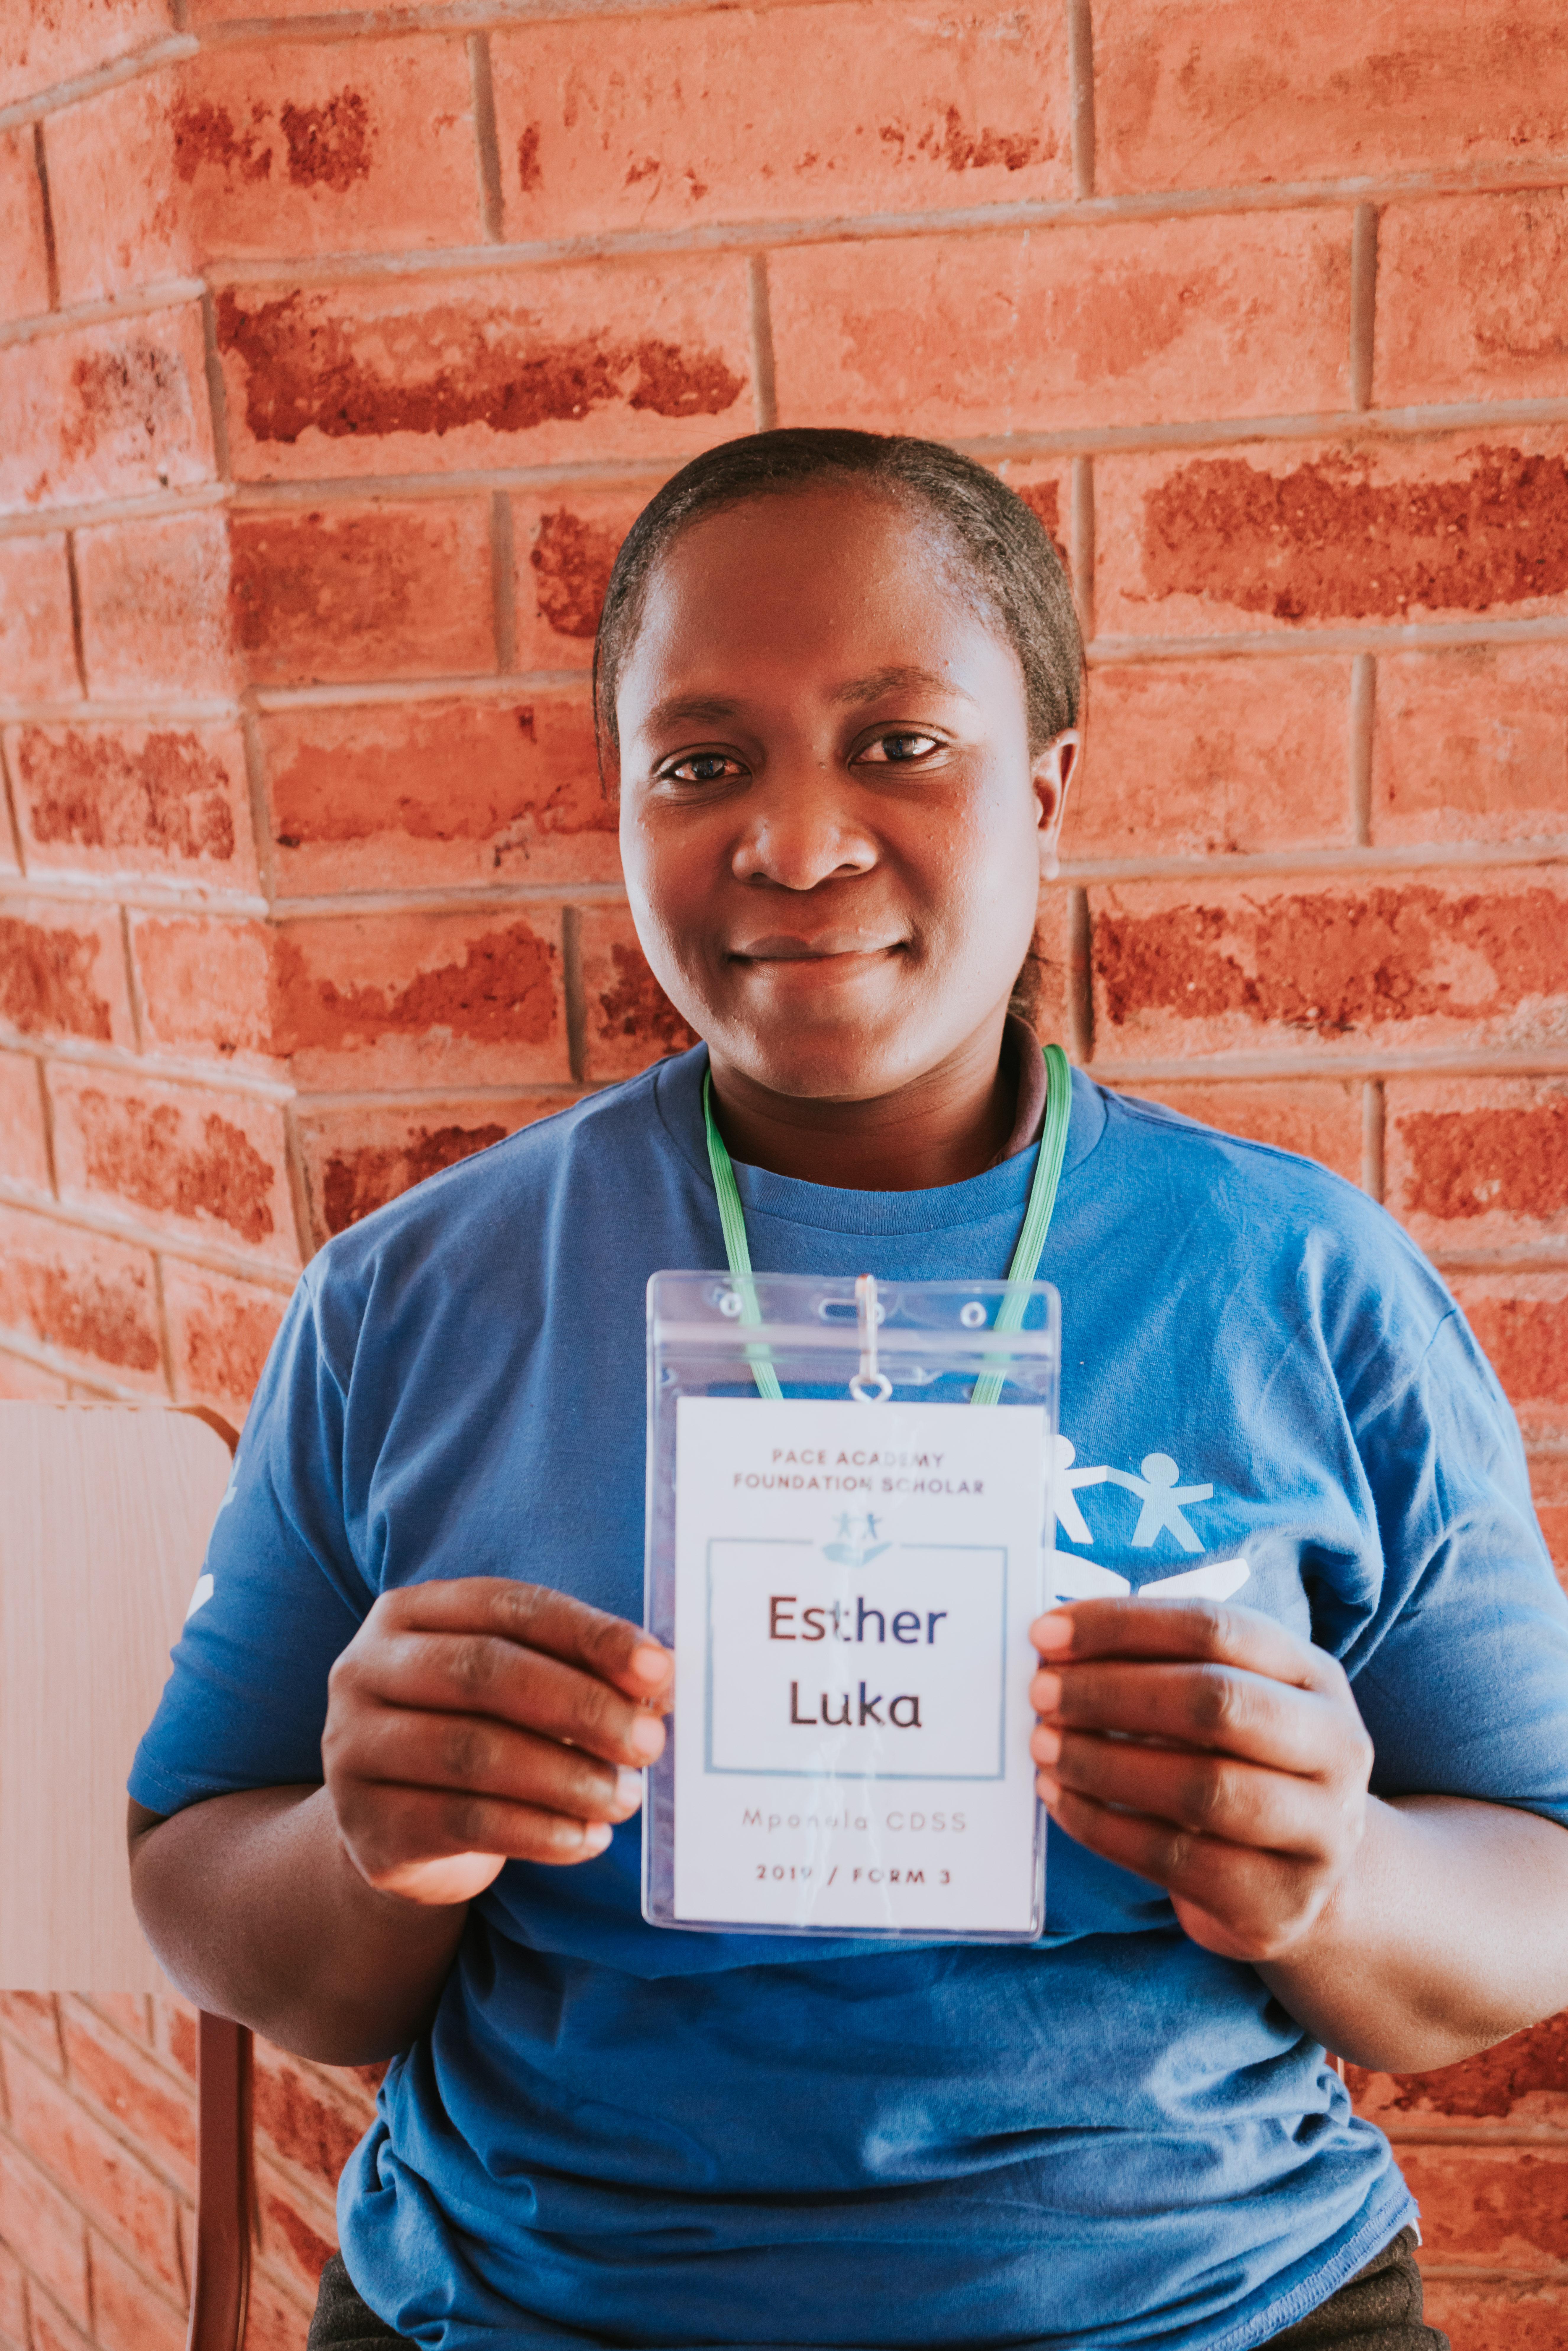 Esther Luka (Mponela CDSS)